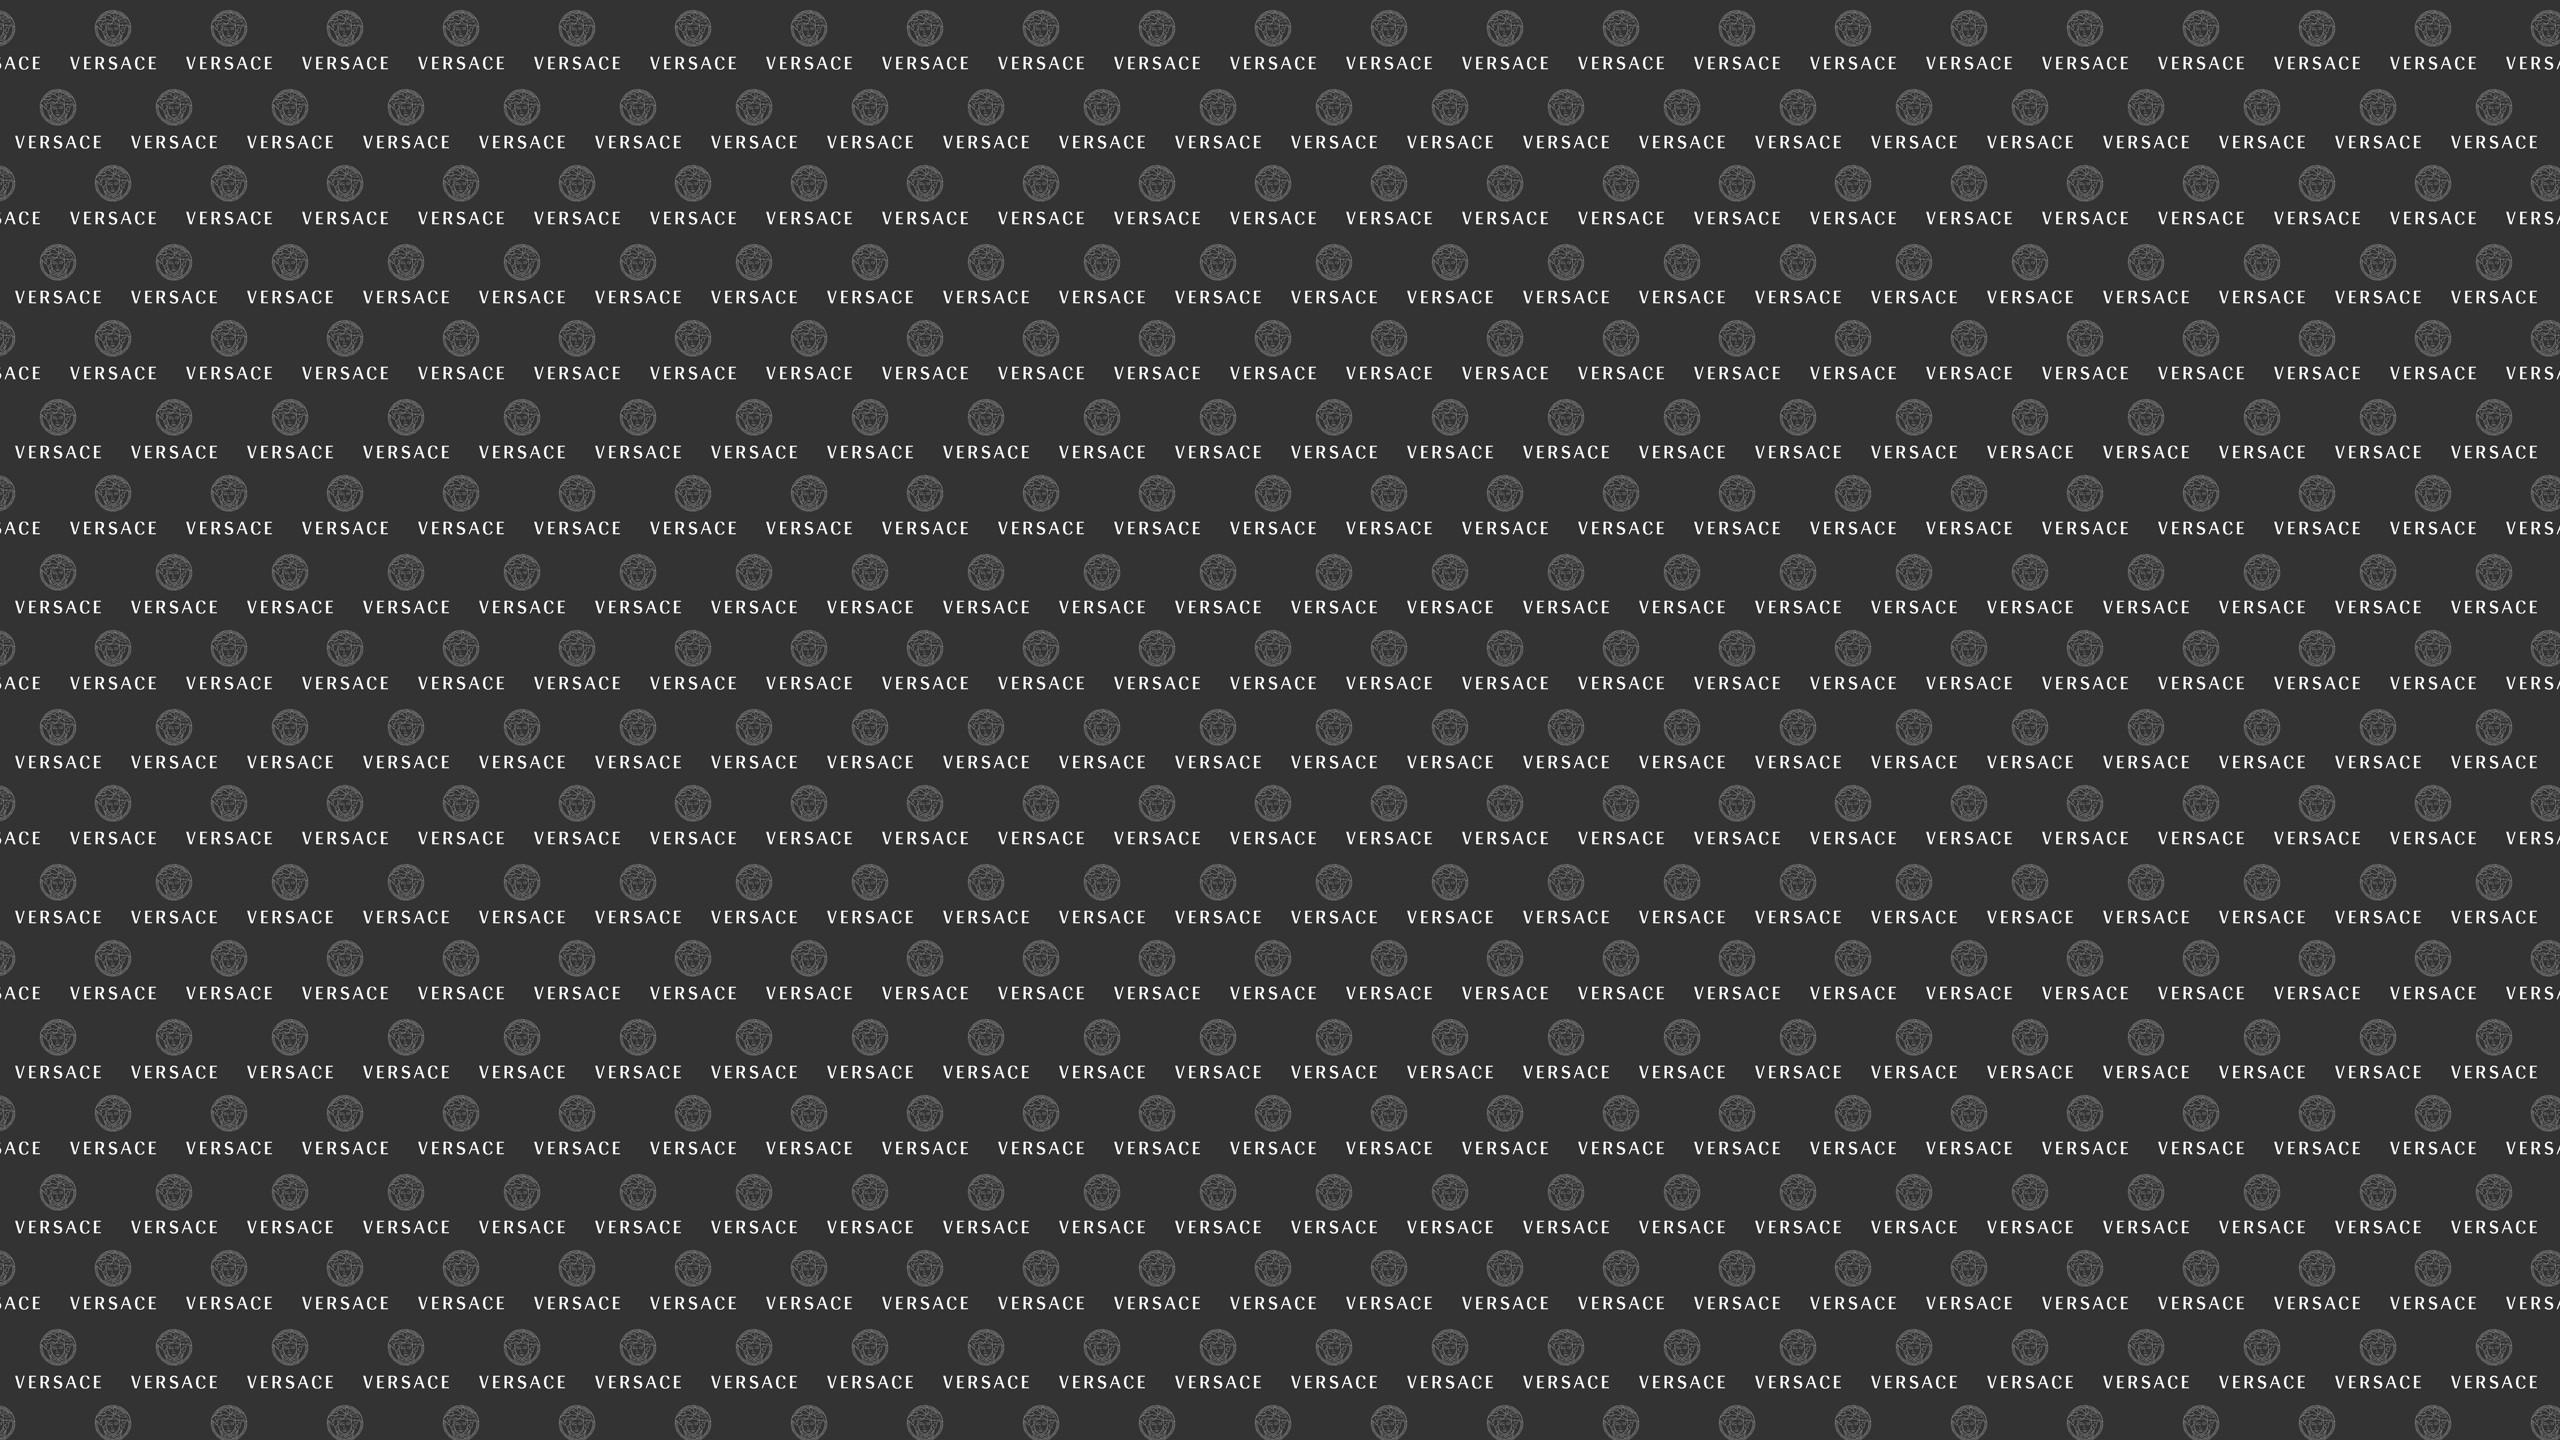 this Versace Desktop Wallpaper is easy. Just save the wallpaper .